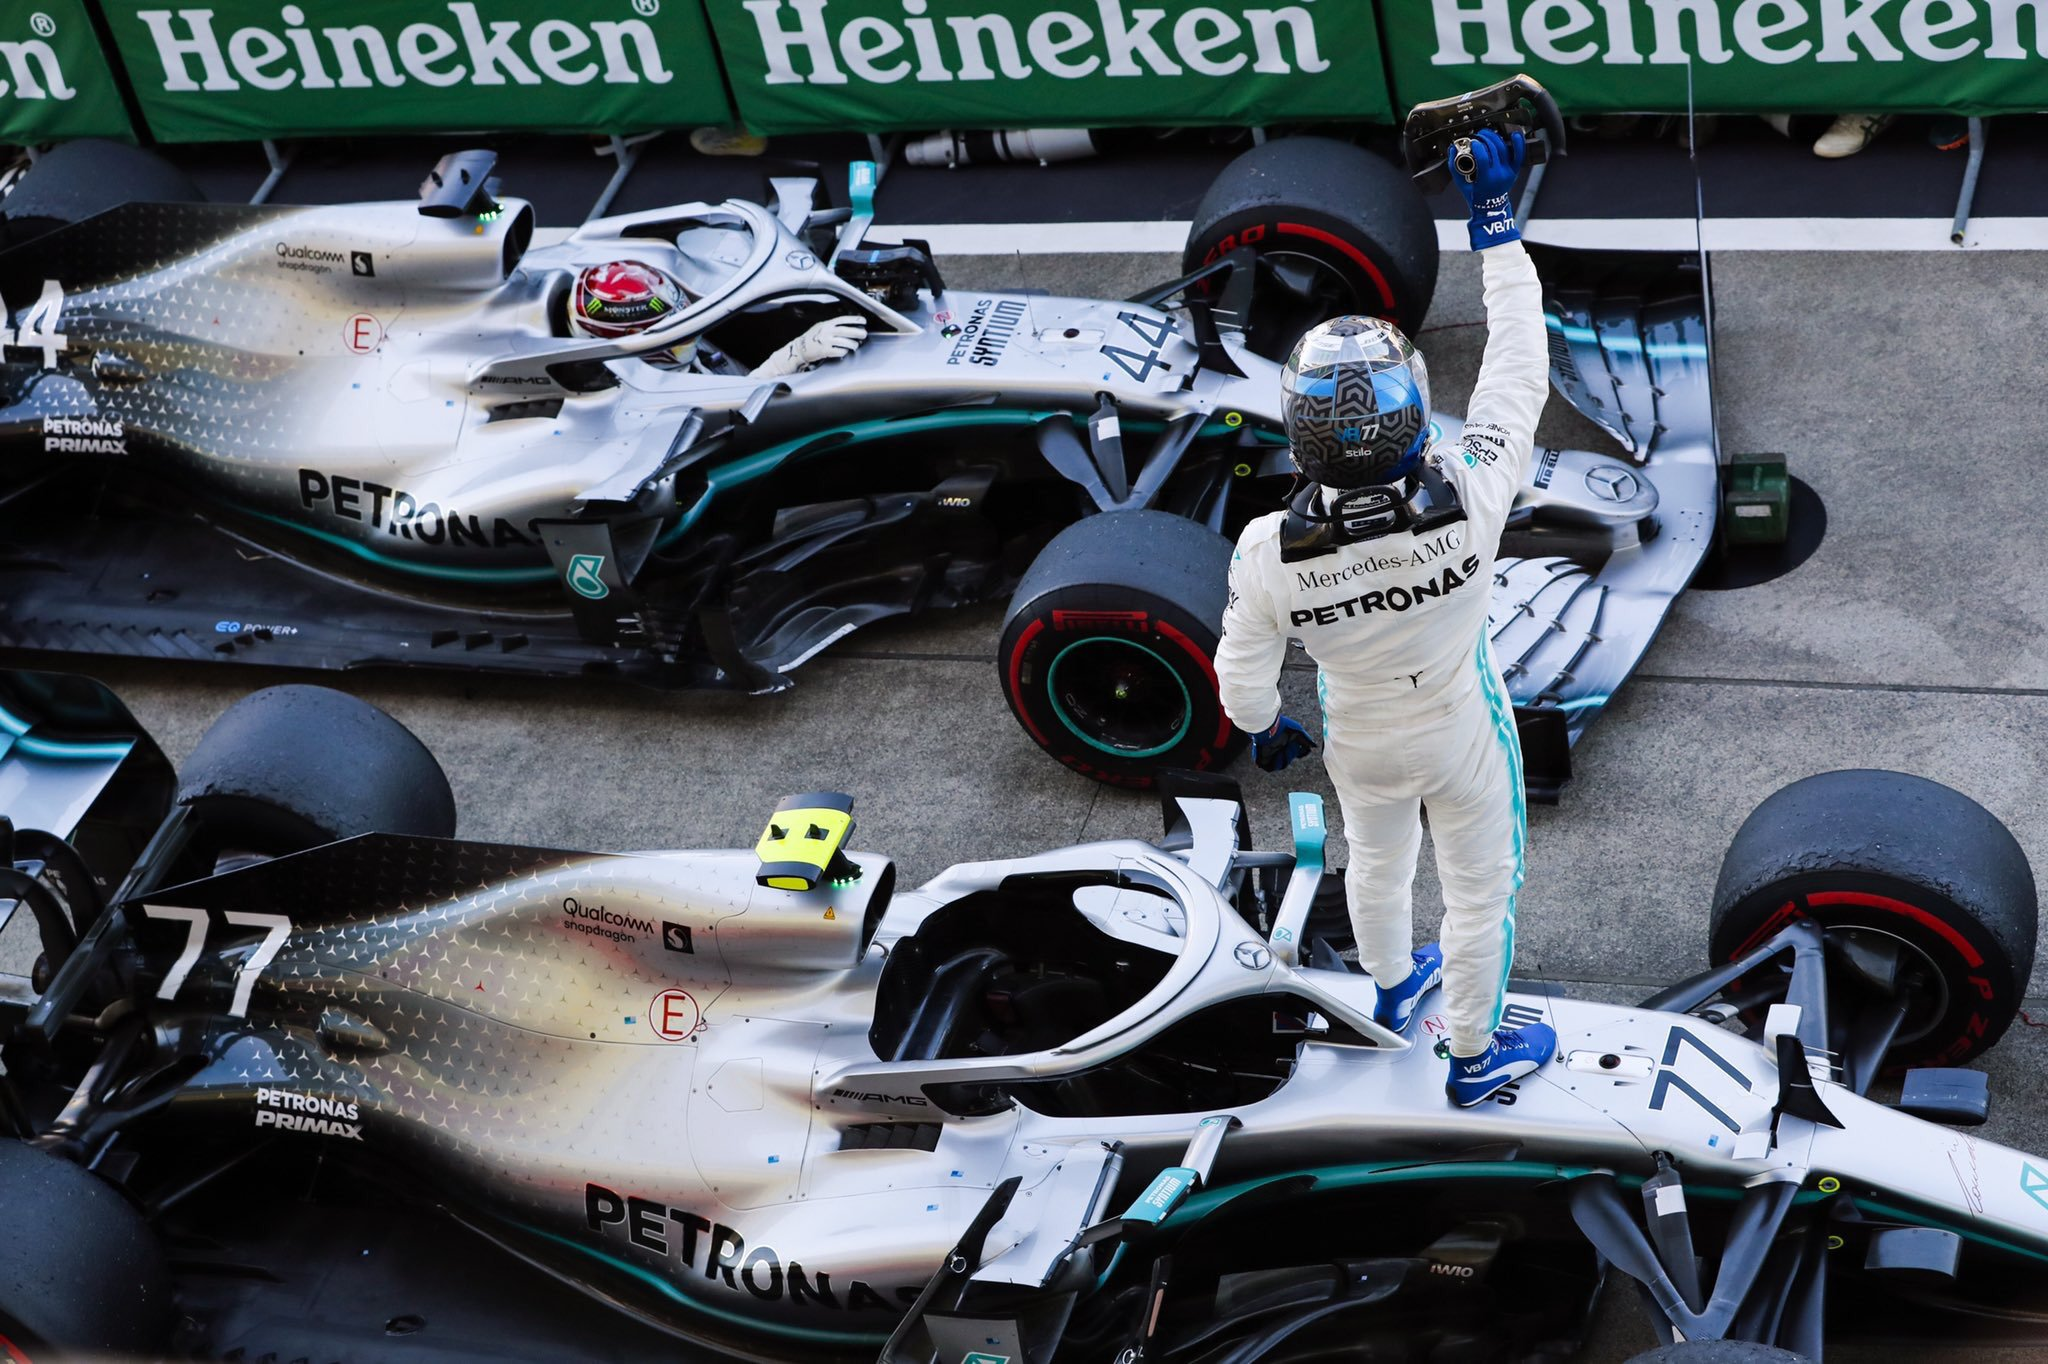 Mercedes - обладатели кубка конструкторов 2019 года!